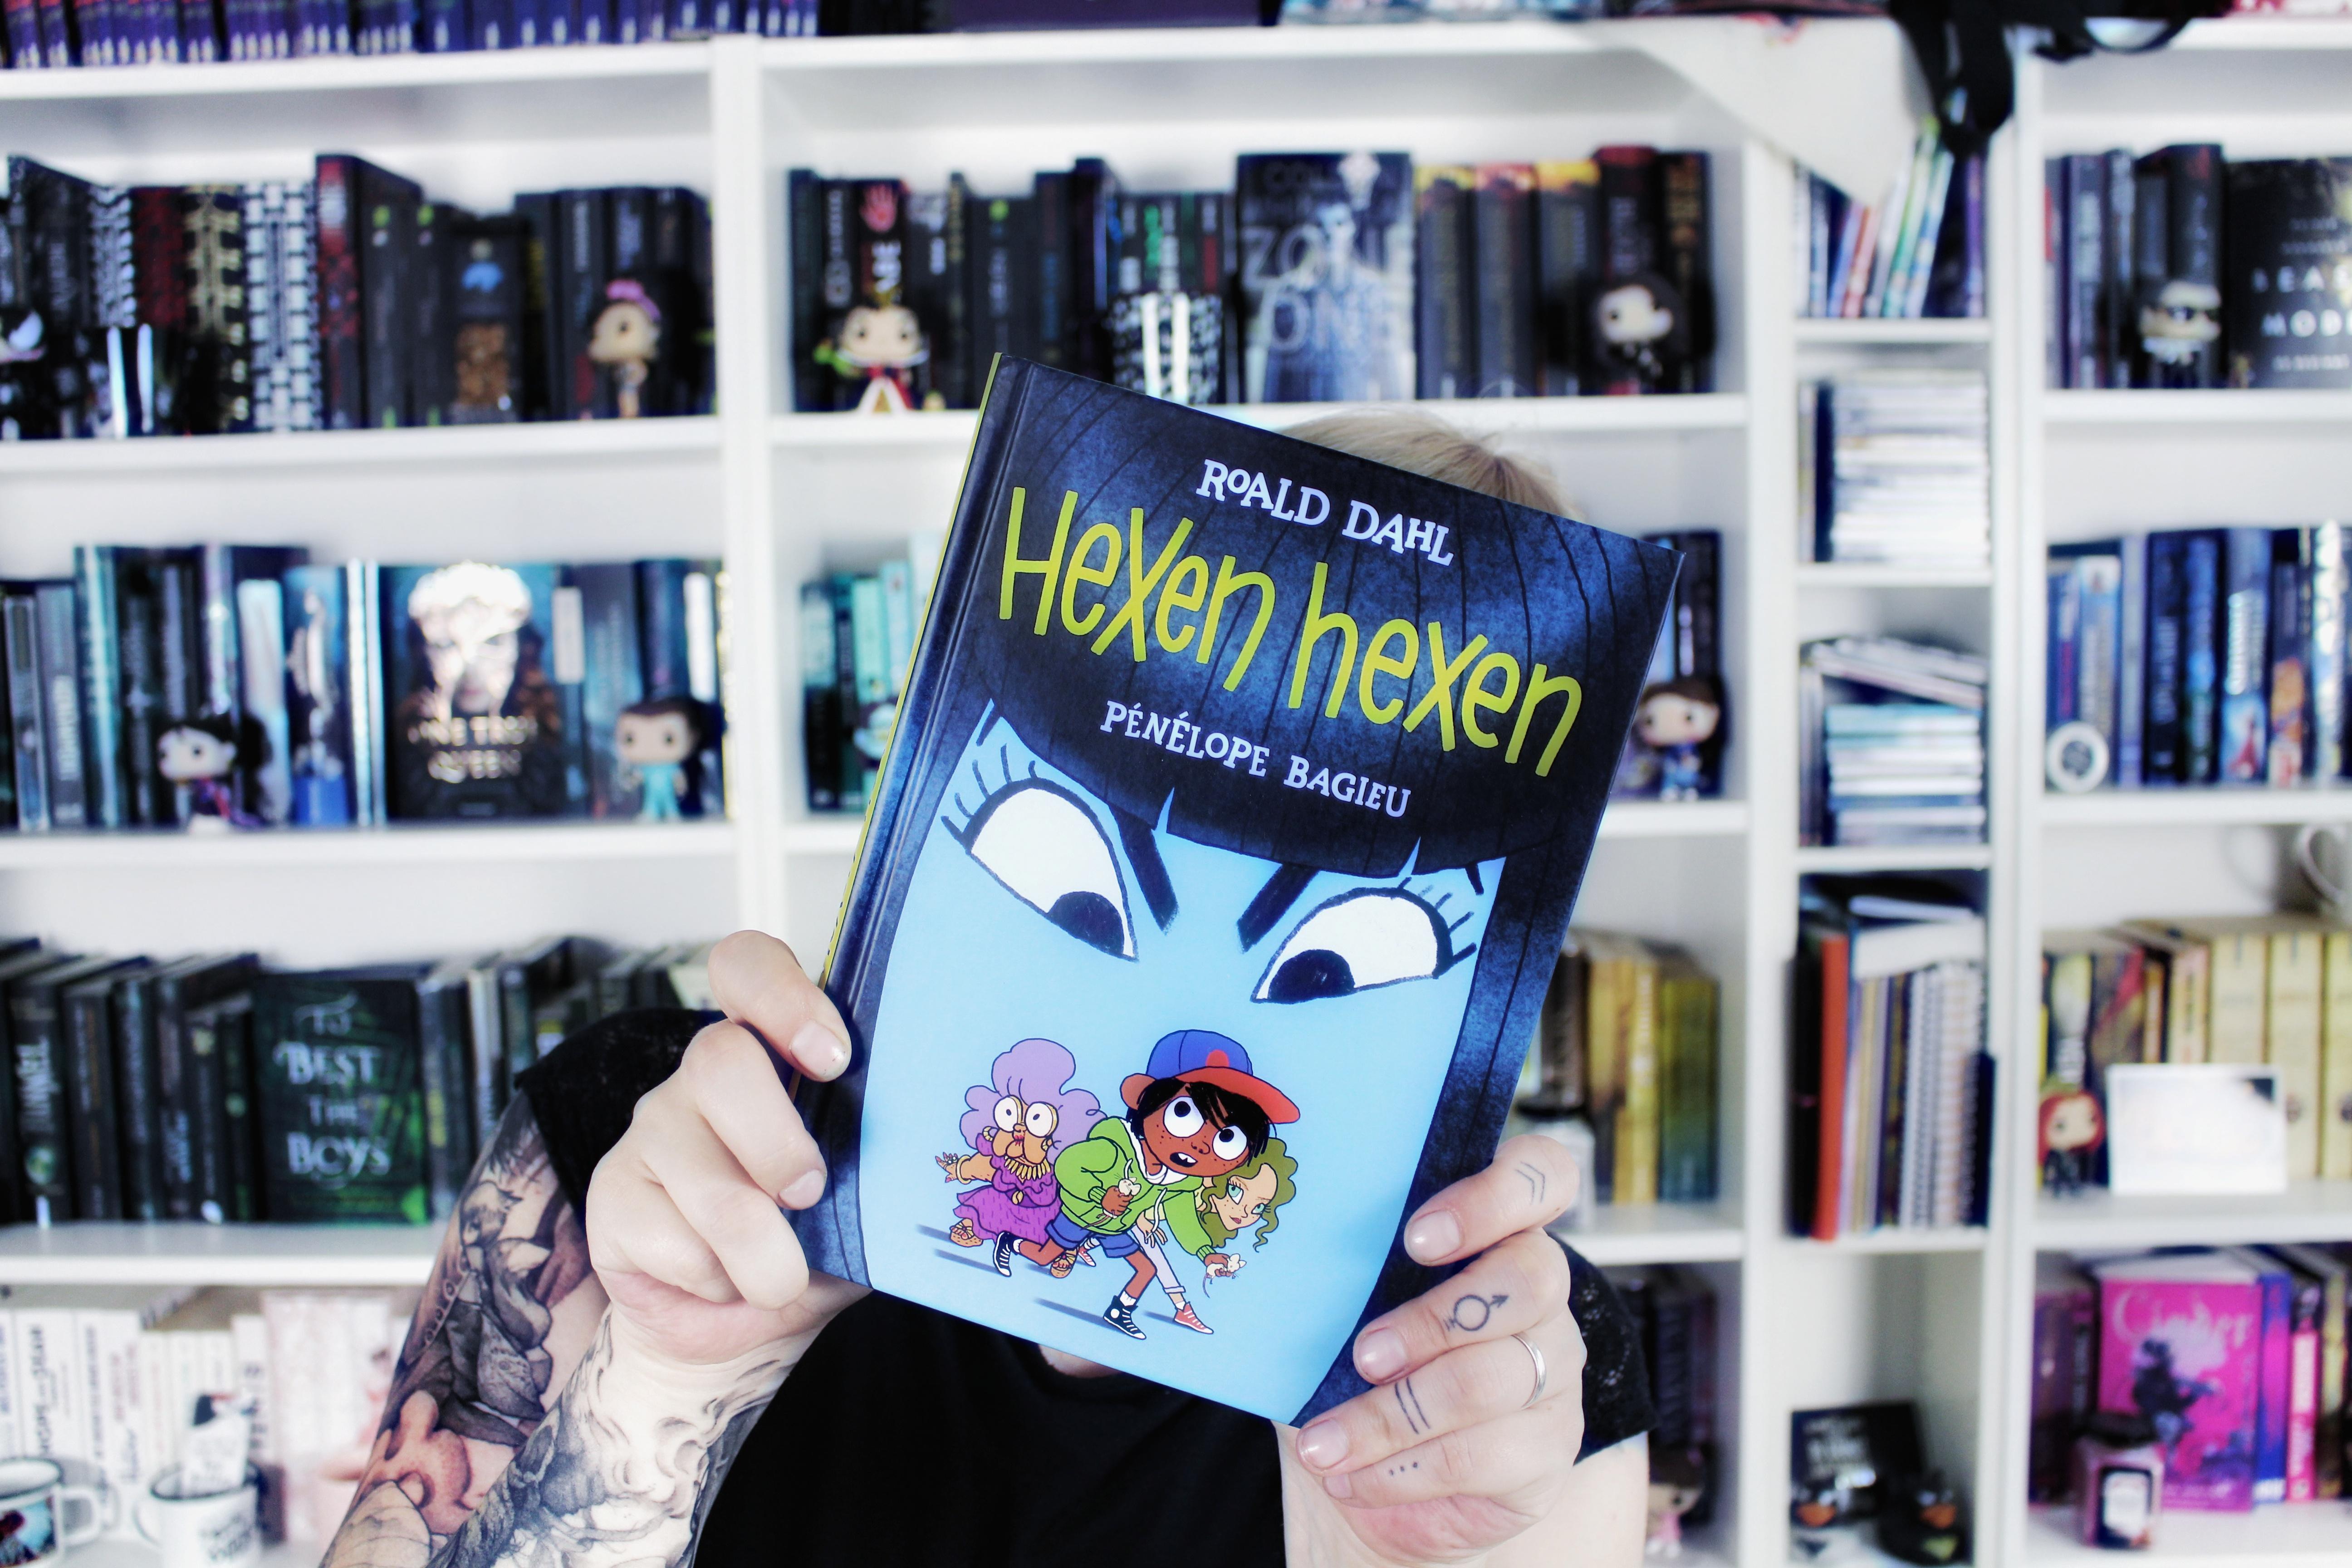 Rezension | Hexen hexen von Roald Dahl & Pénélope Bagieu